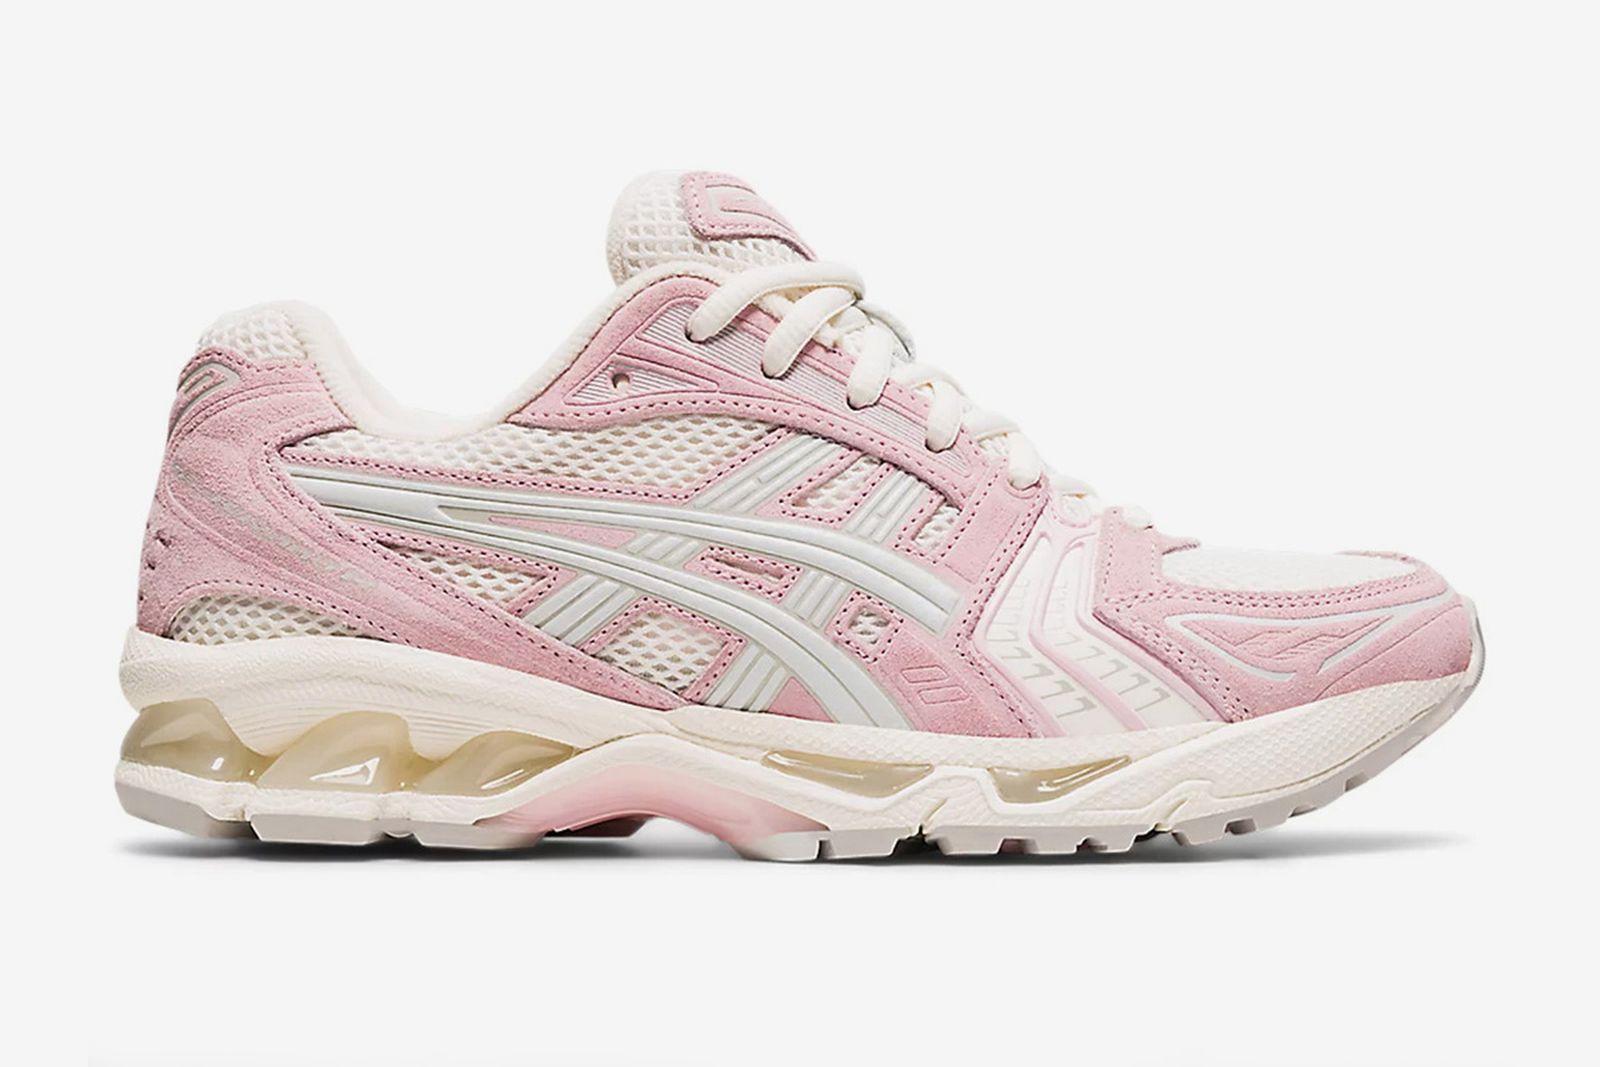 asics-gel-kayano-14-pink-salt-release-date-price-01